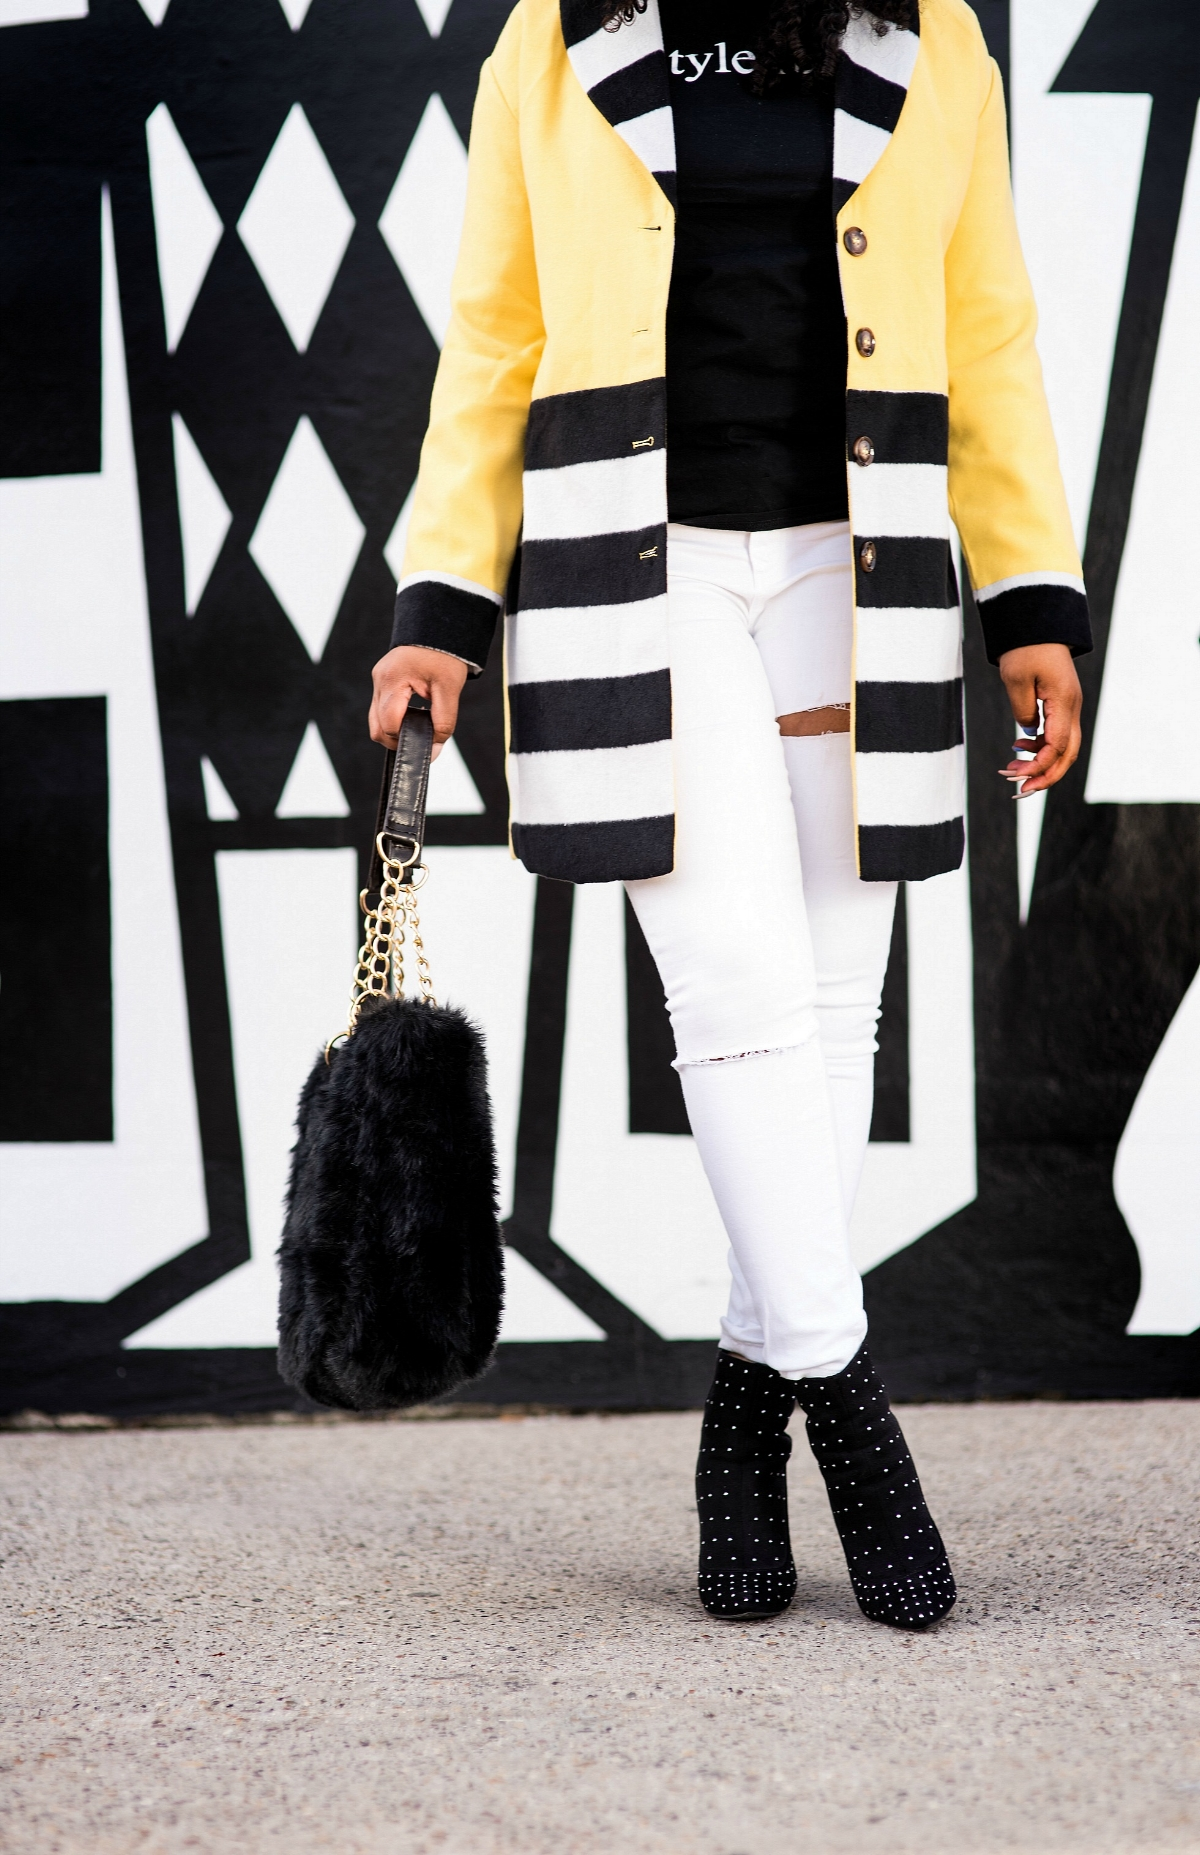 Style & Poise: